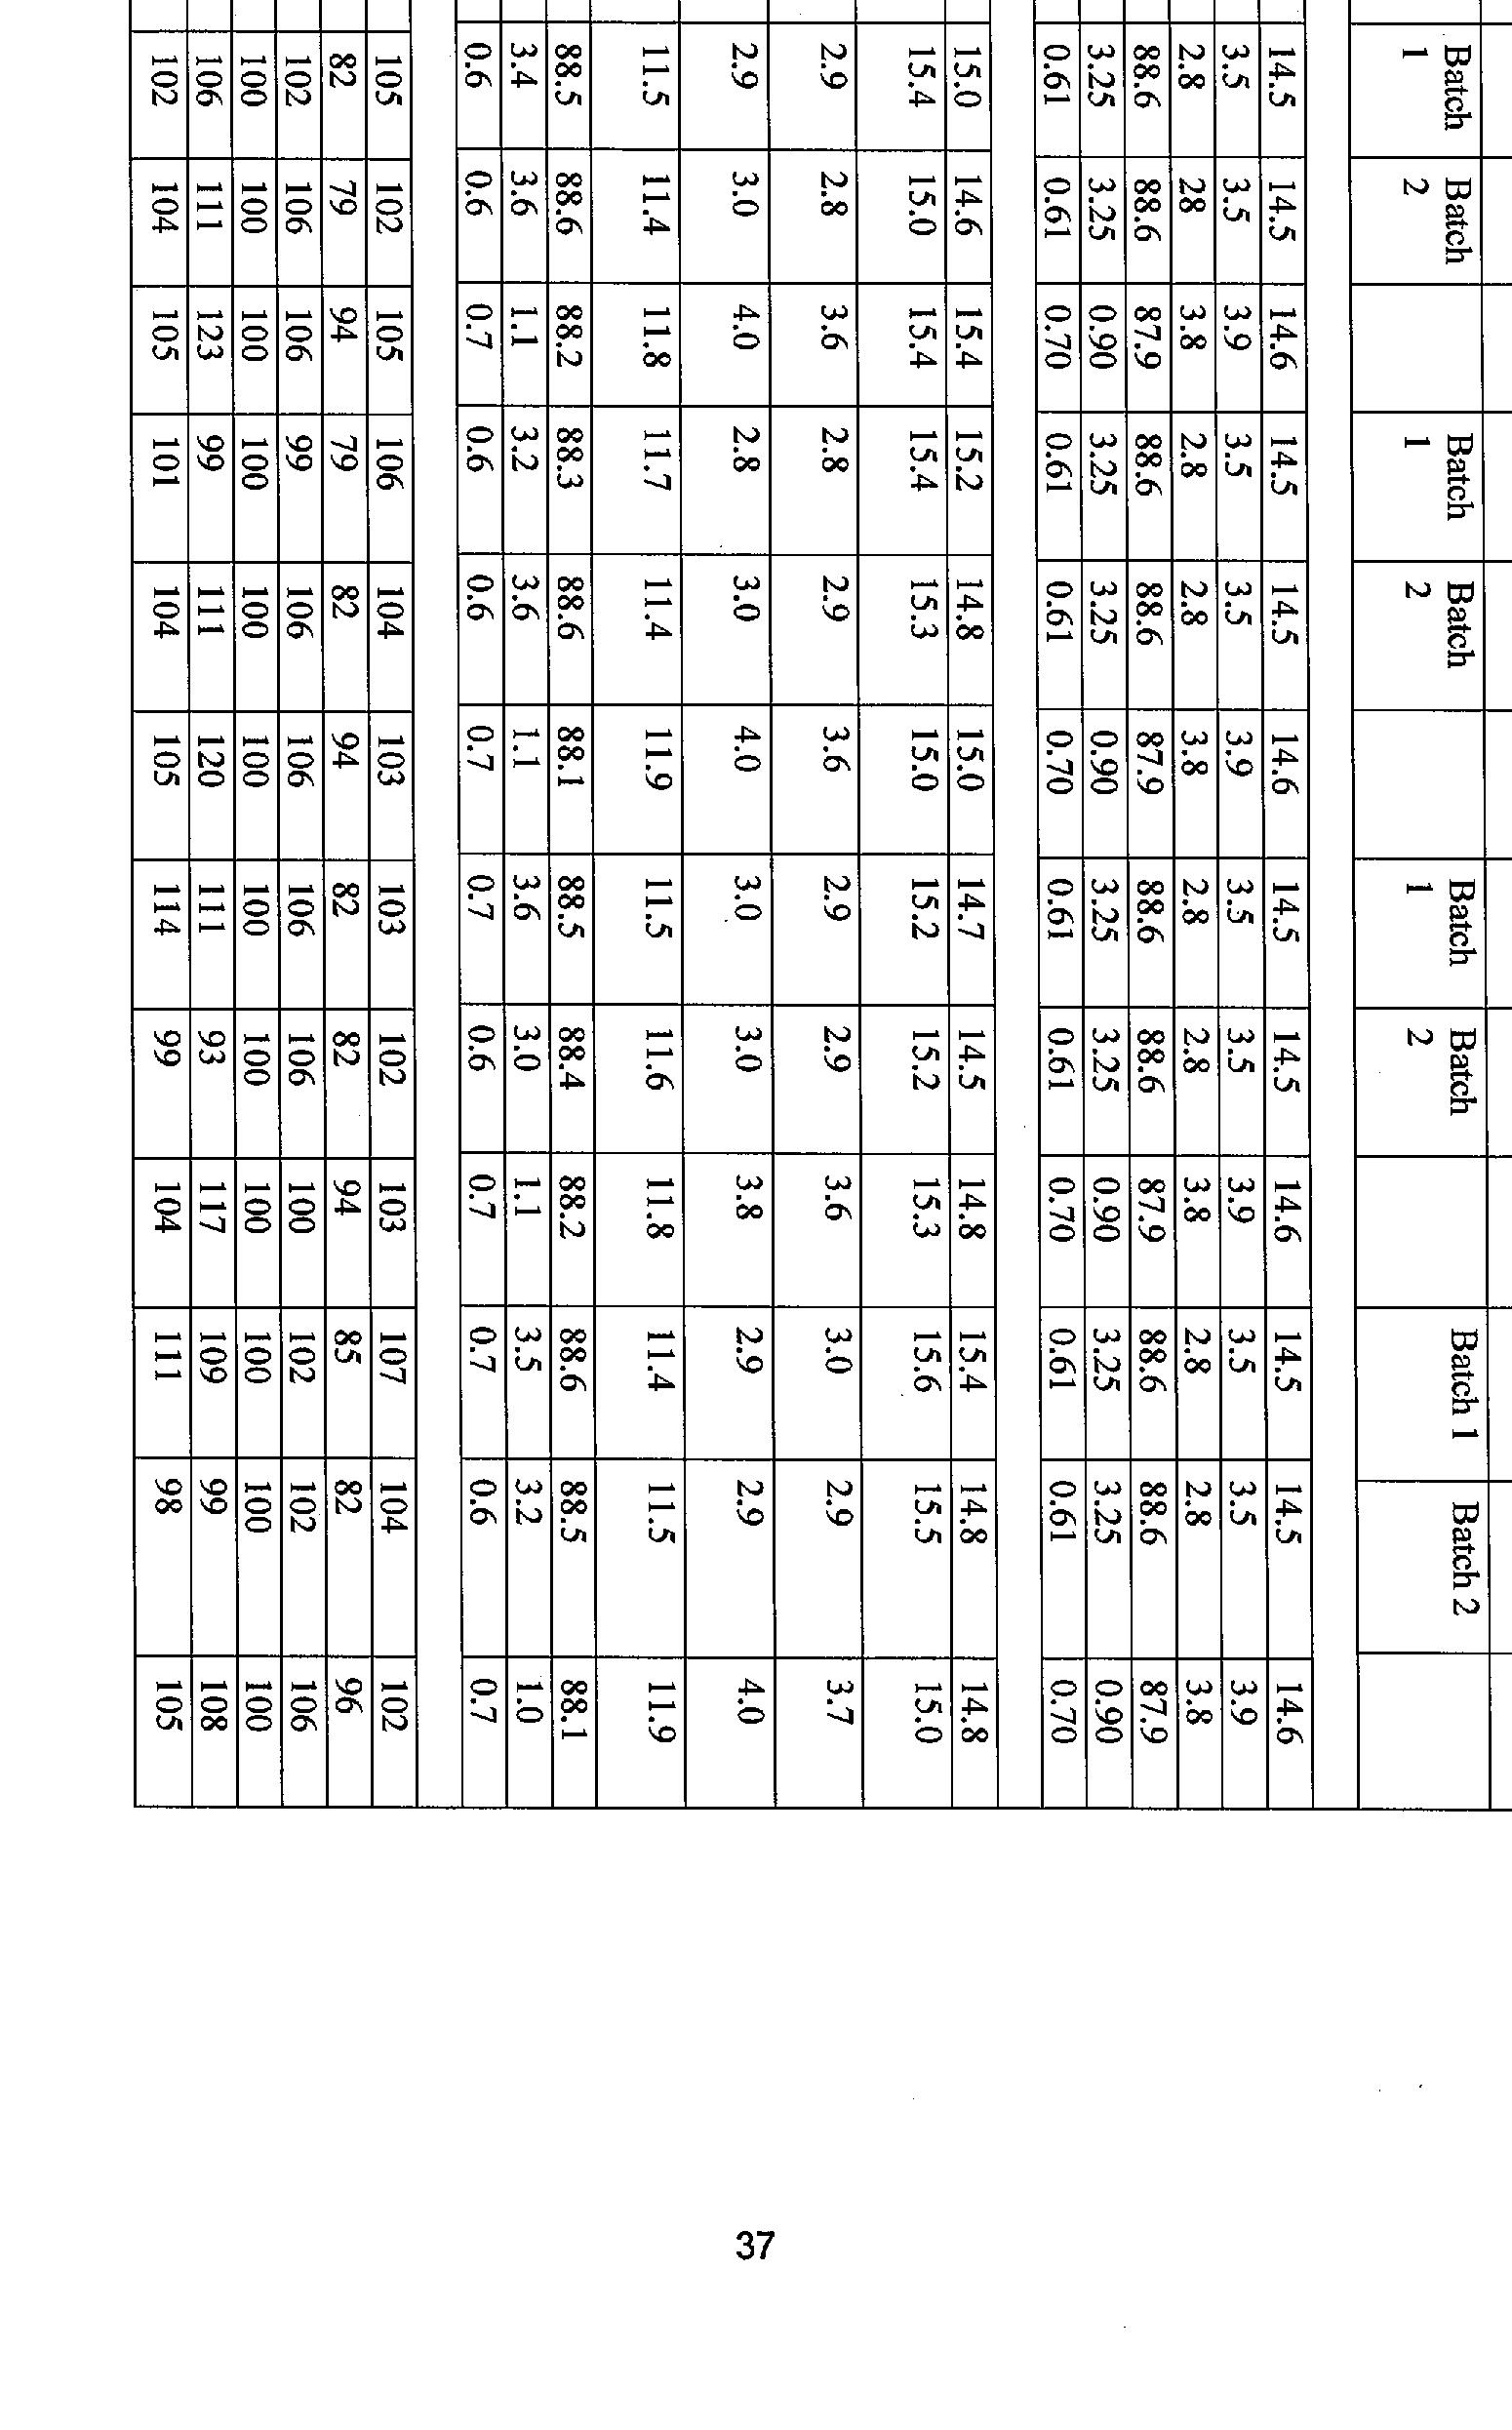 WO2015184311A2 - Method of feeding an animal - Google Patents